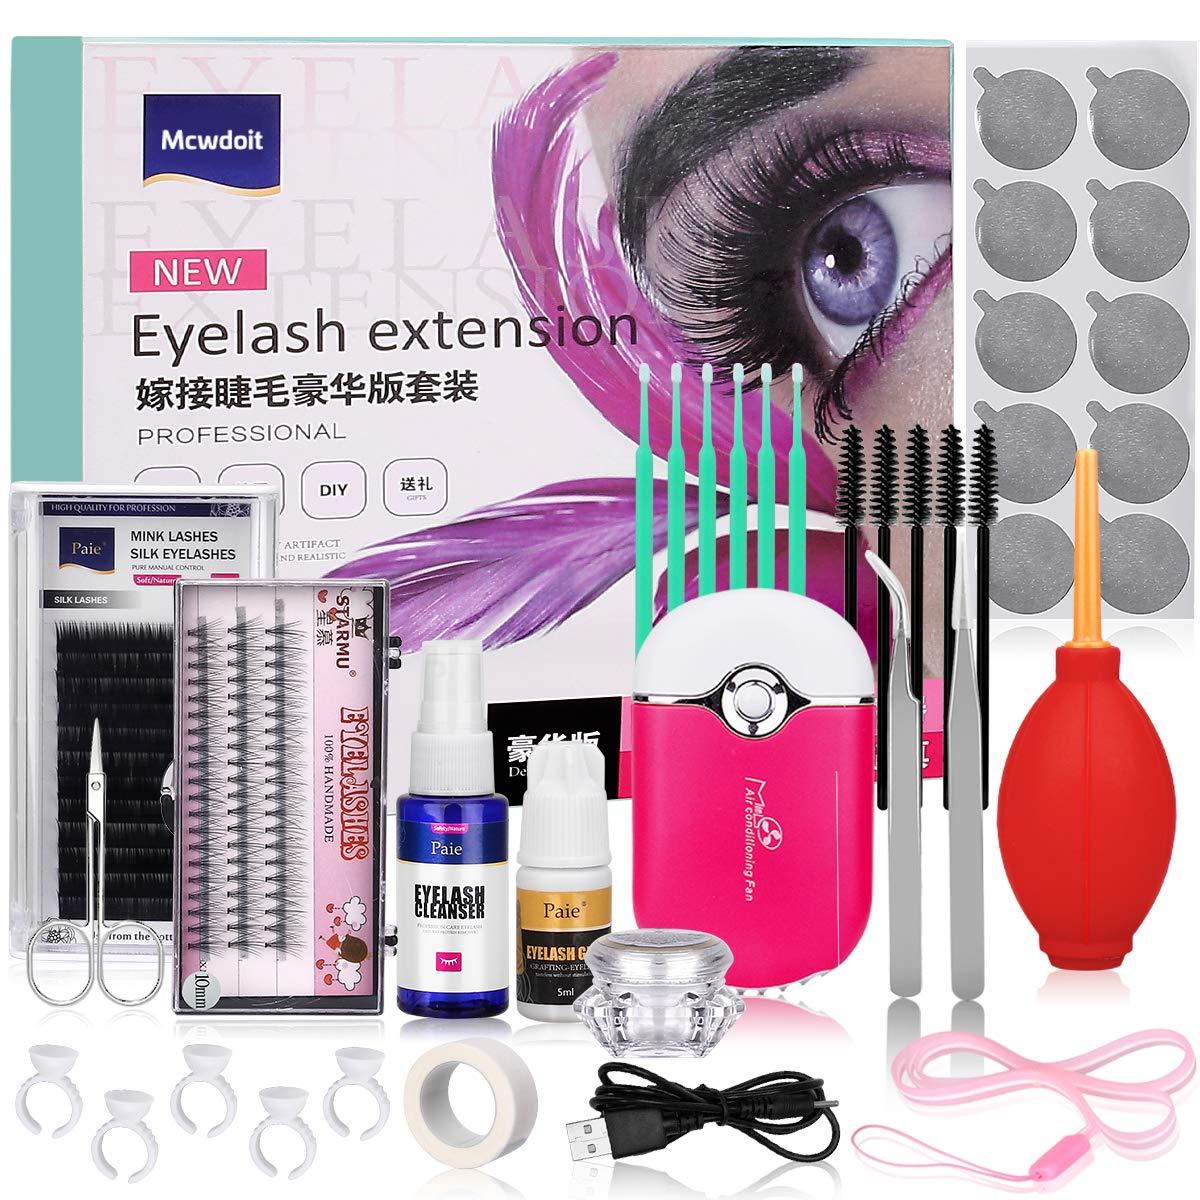 Pro 21 Pcs Eyelash Extension Kit, Mcwdoit Professional False Lashes Eyelashes Extension Practice Set Tools Lash Starter Kit Eyelash Grafting Training Tool for Makeup Practice Eye Lashes Graft